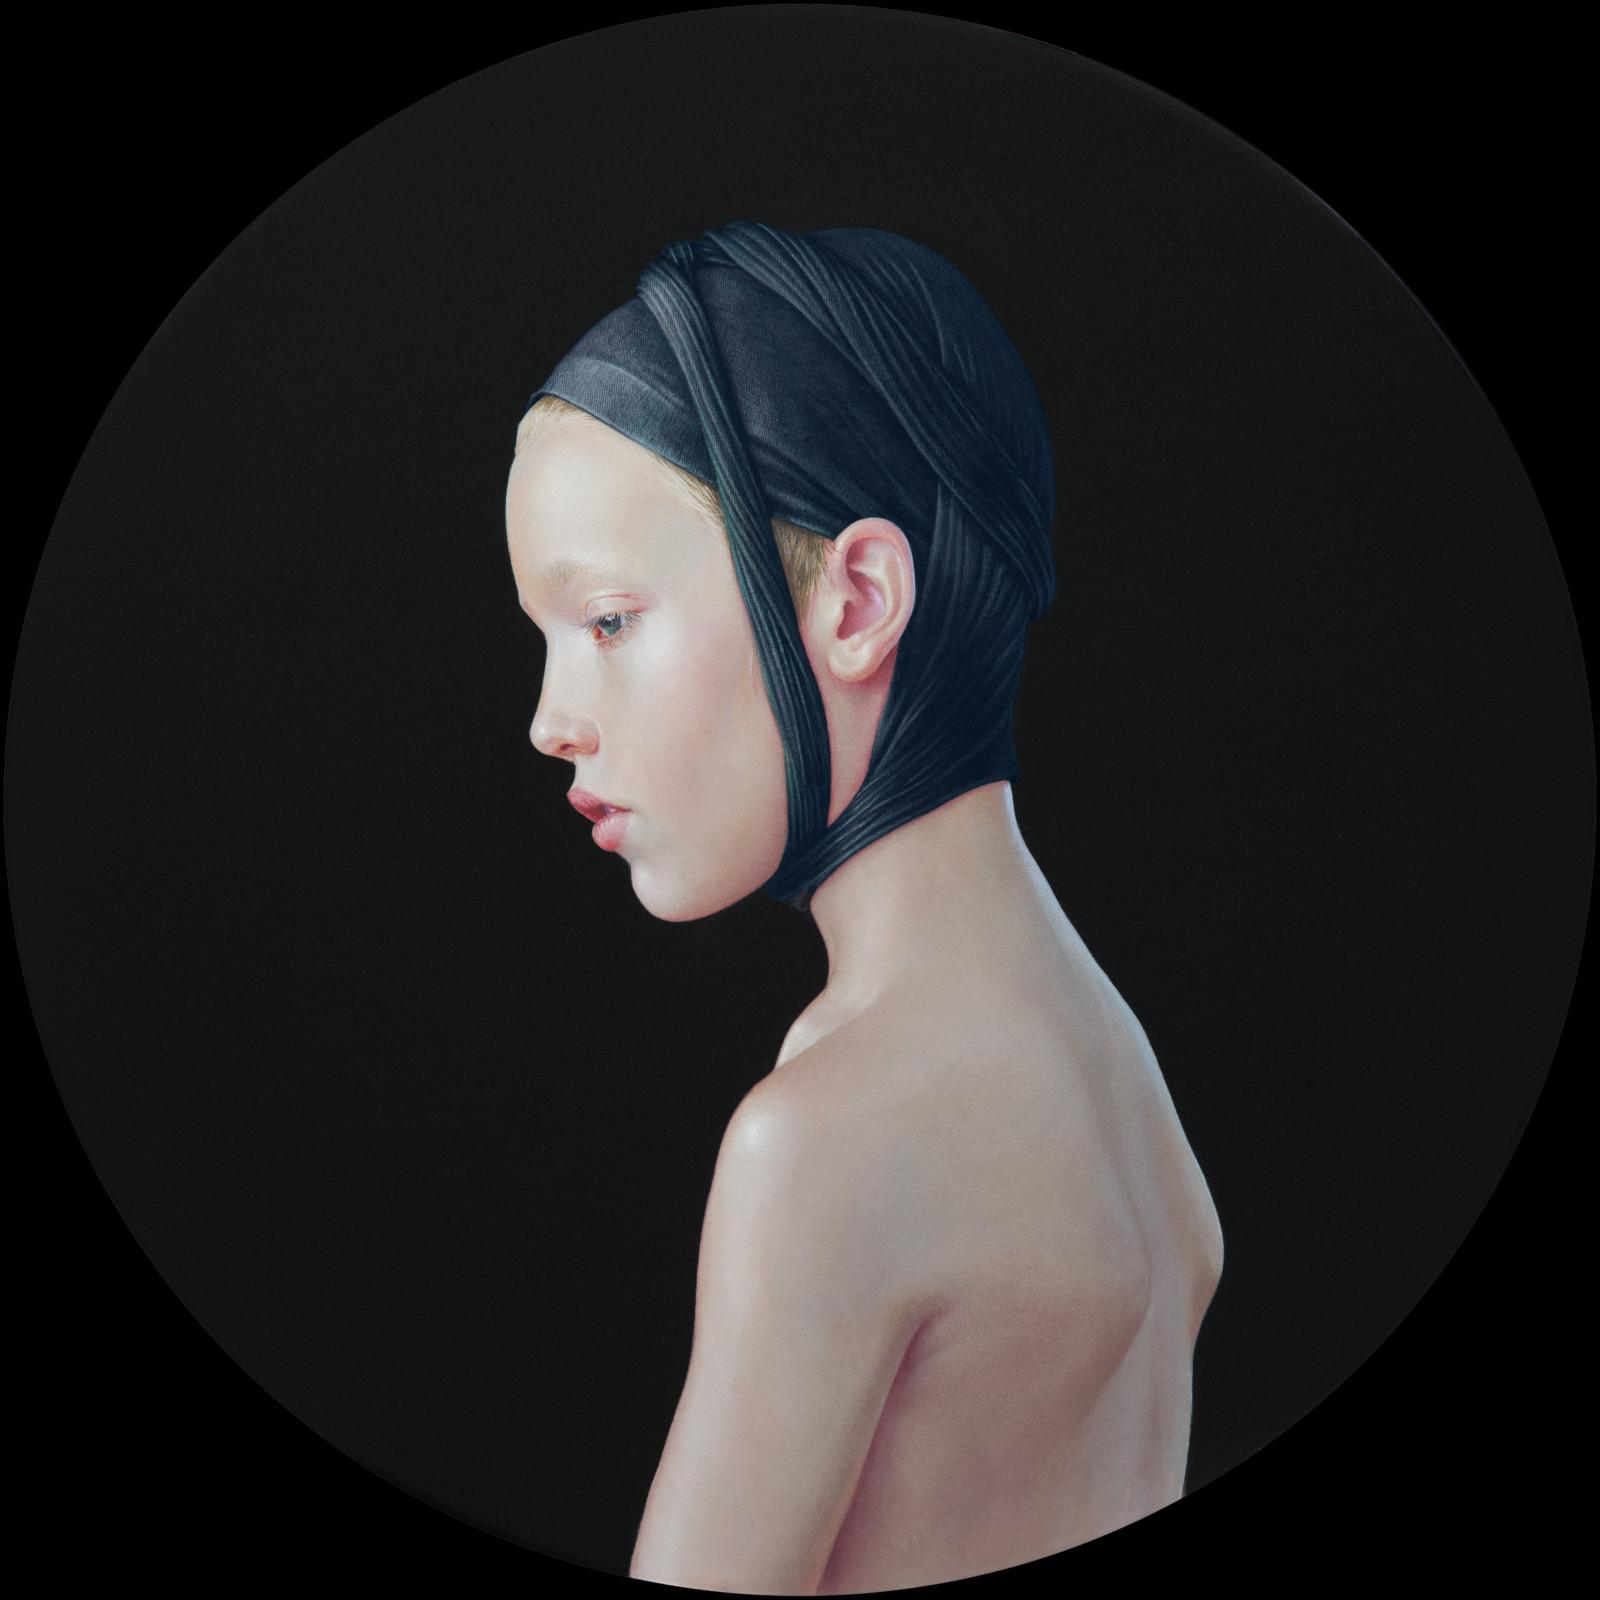 Salustiano - Seville, Spain artist